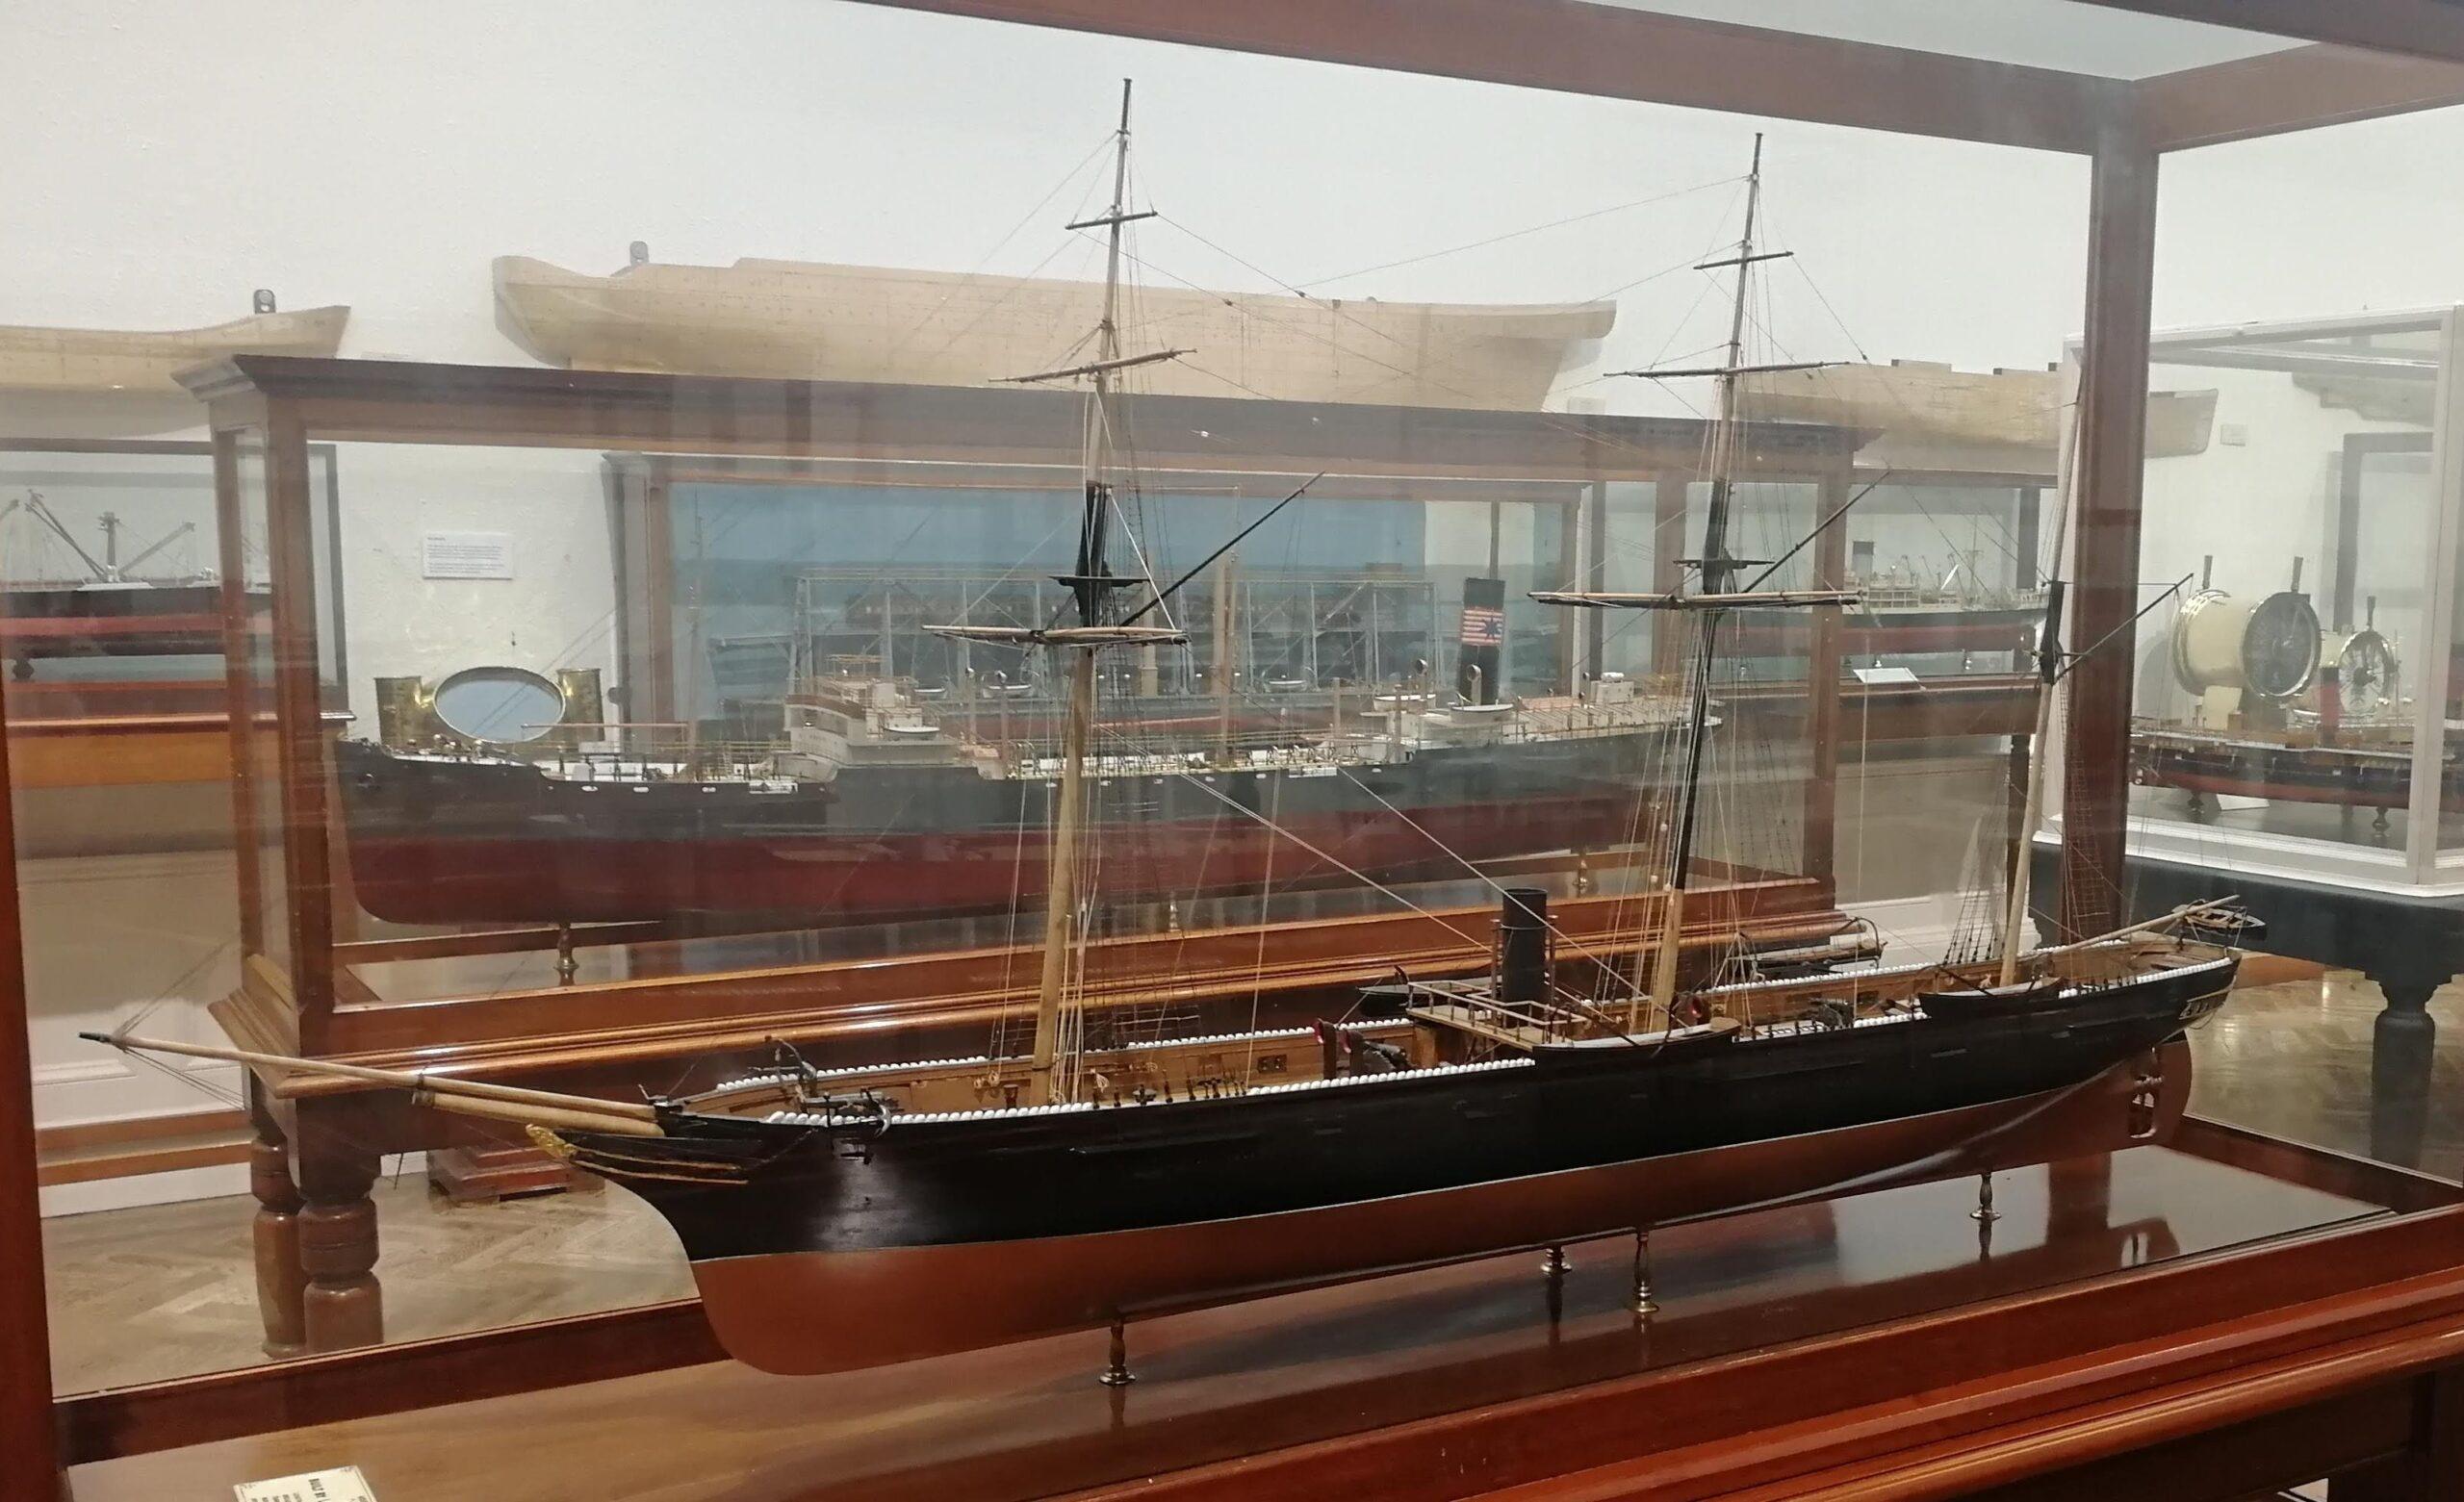 ship model in a glass case